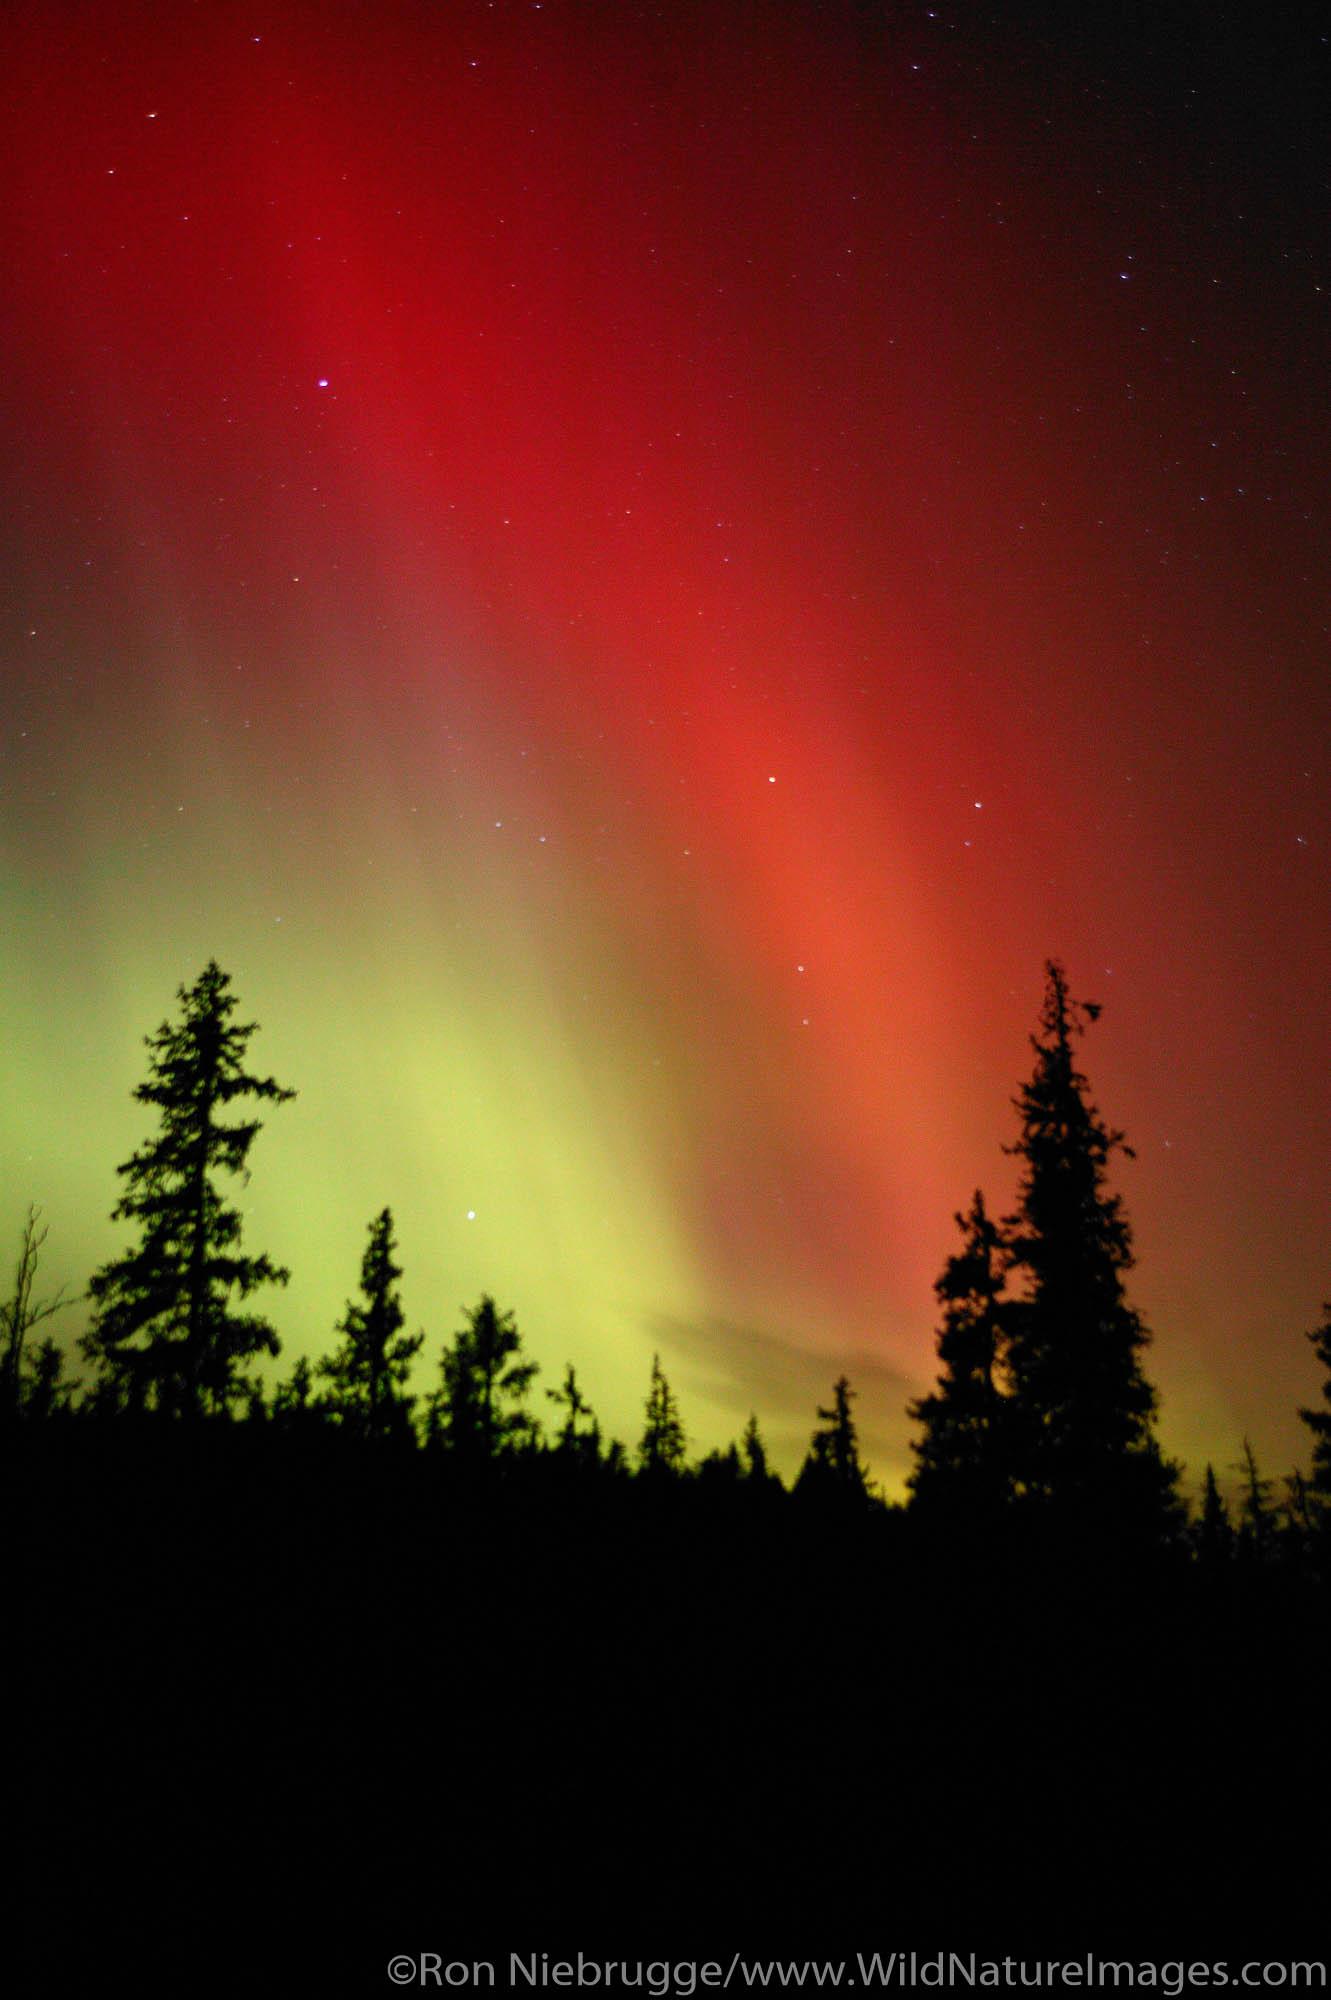 Colorful Northern Lights (Aurora Borealis), Chugach National Forest on the Kenai Peninsula near Seward, Alaska.